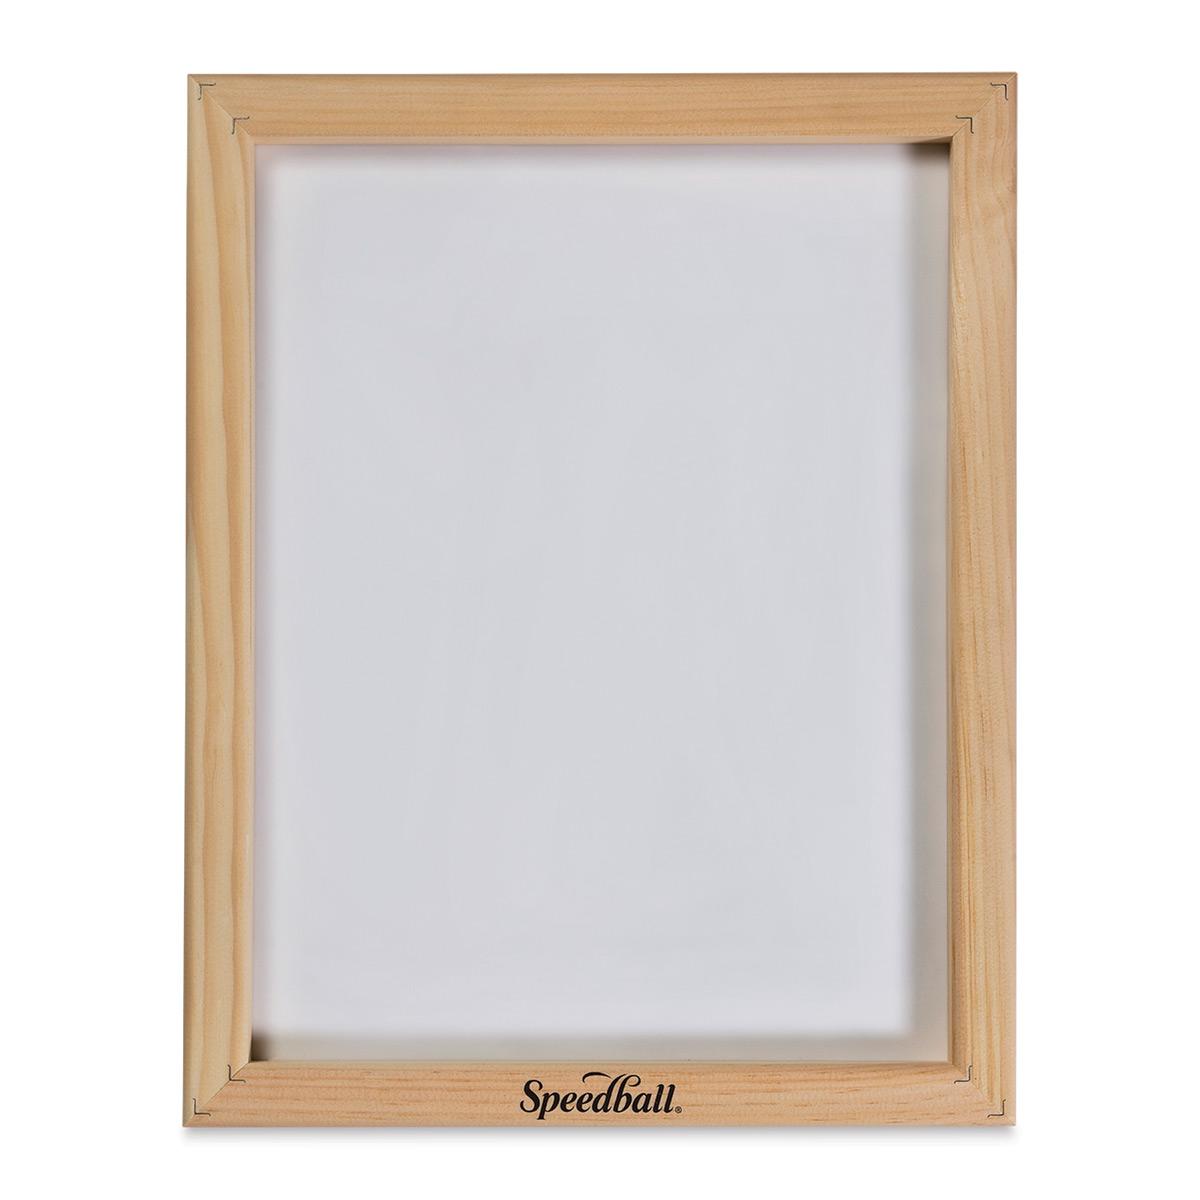 Speedball Screenprinting Frame - 110 Monofilament - 10 x 12